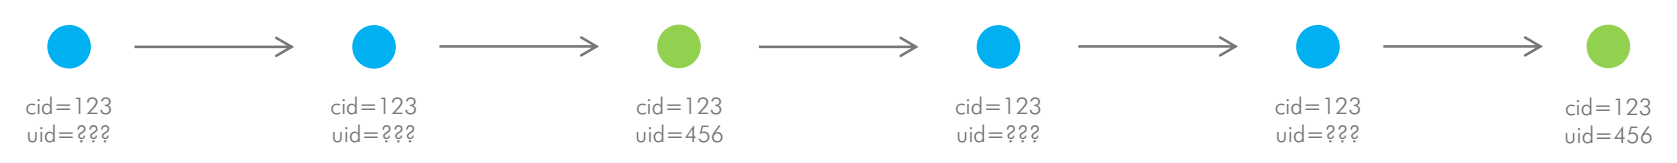 Google Analytics cross-device Model